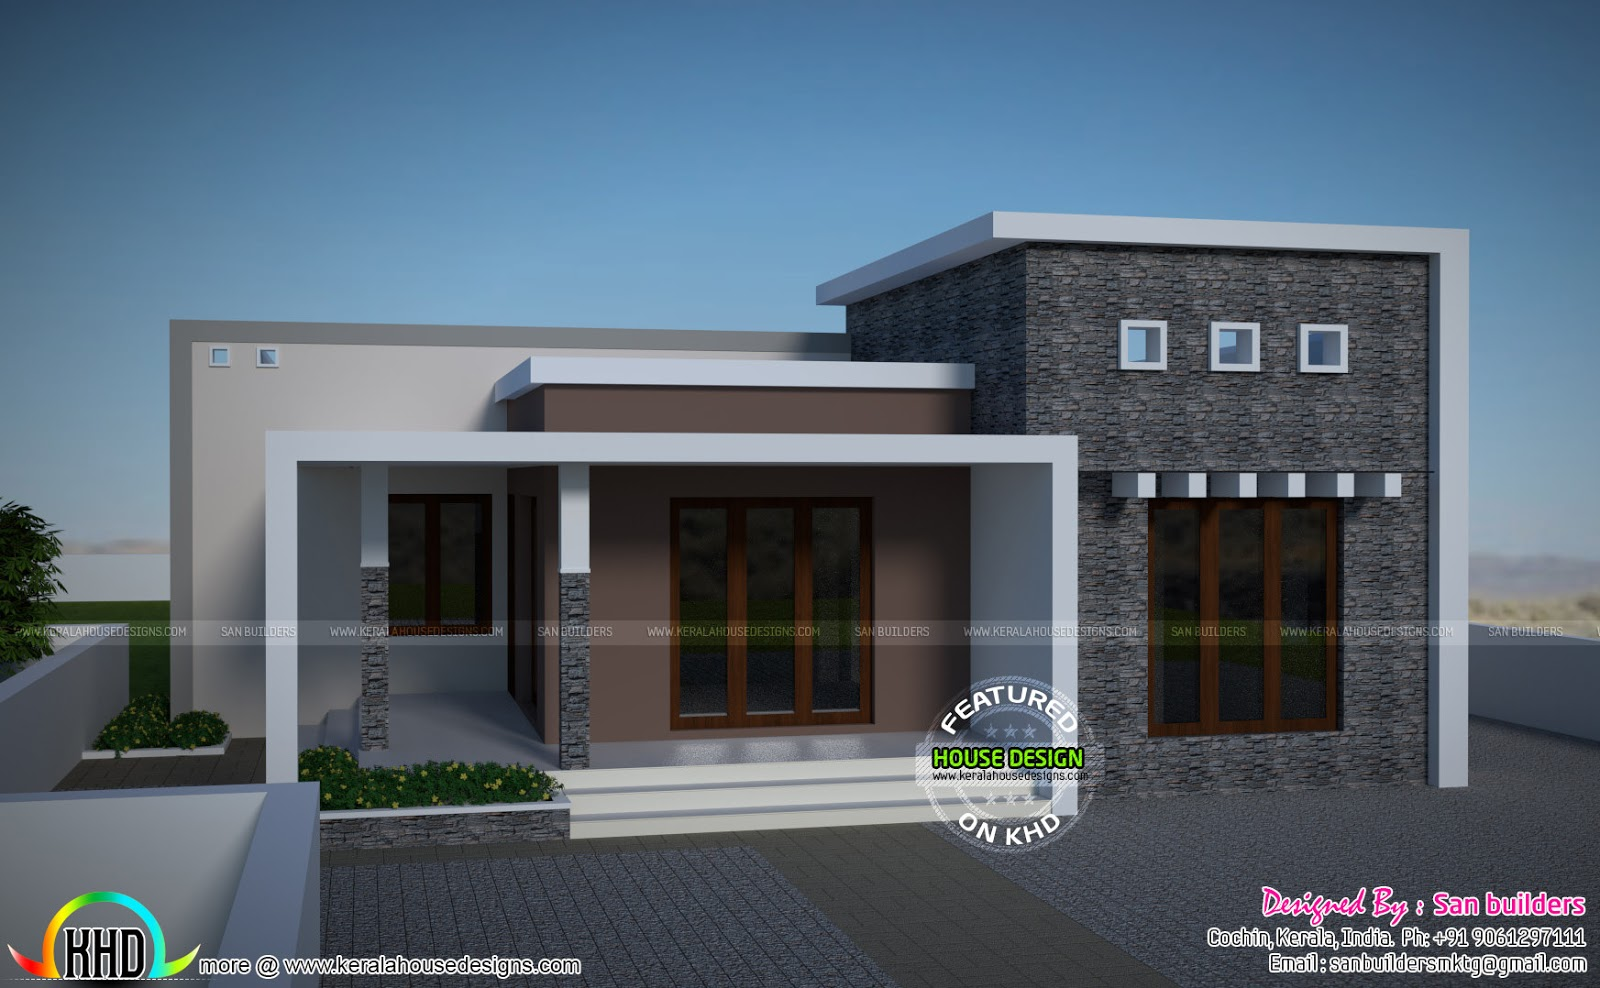 Marvellous House Plans Below 20 Lakhs Gallery